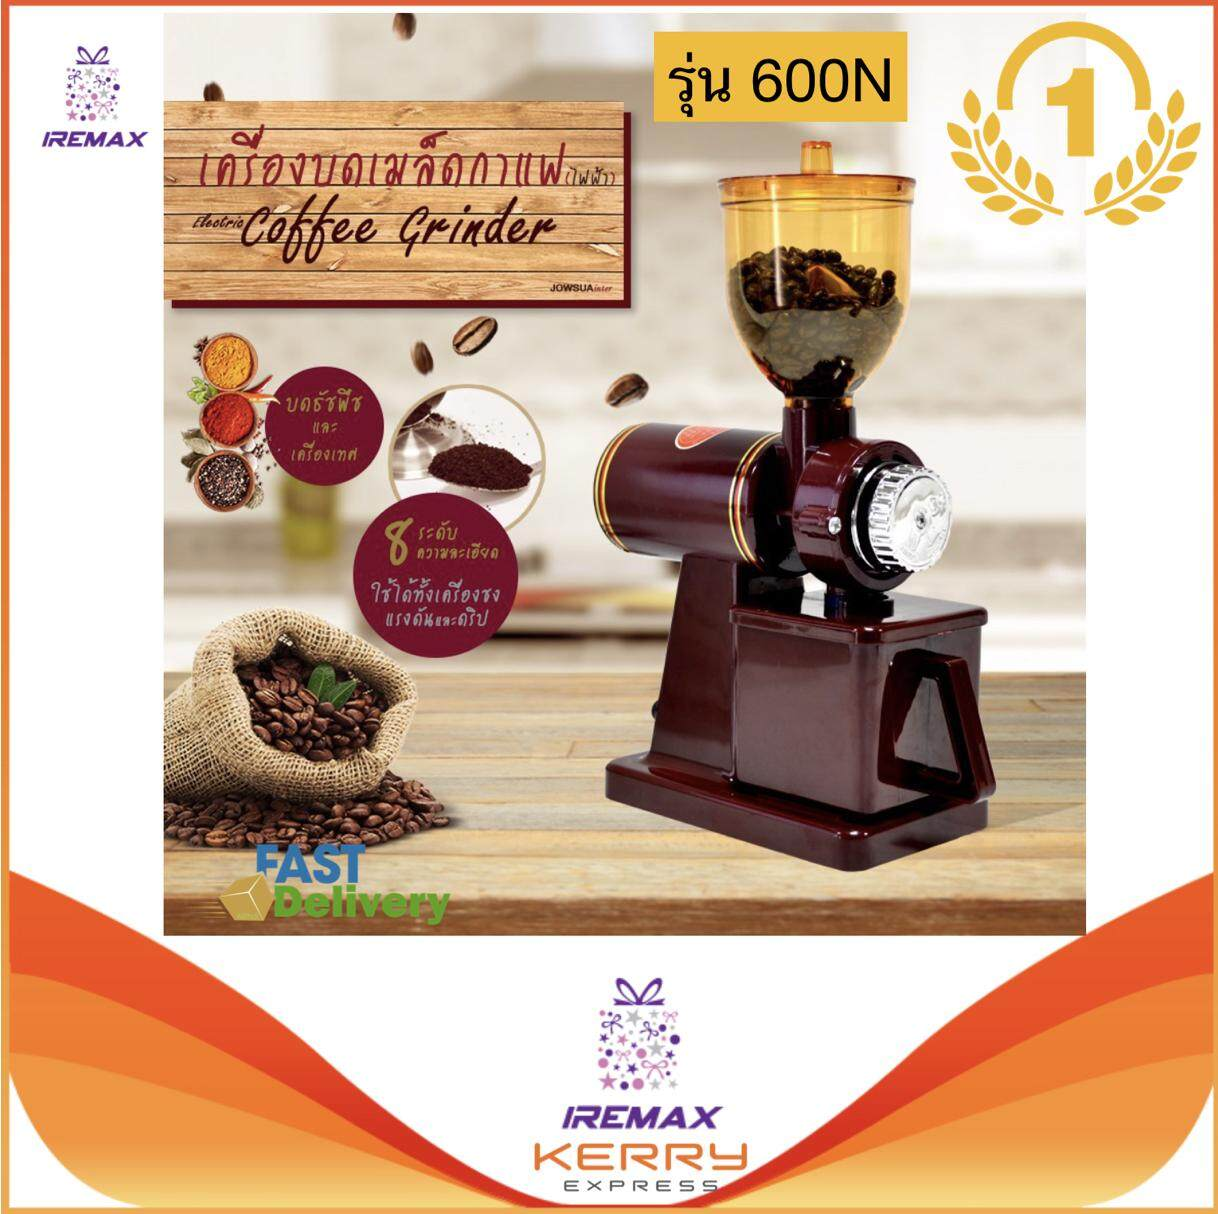 iRemax เครื่องบดกาแฟ เมล็ดกาแฟสด เครื่องบดเมล็ดกาแฟ รุ่น Coffee Grinder 600N  - e79c59cc5df57ffcdb97df3ace99a9e5 - แนะนำเครื่องชงกาแฟชุดเล็ก สำหรับเริ่มต้น